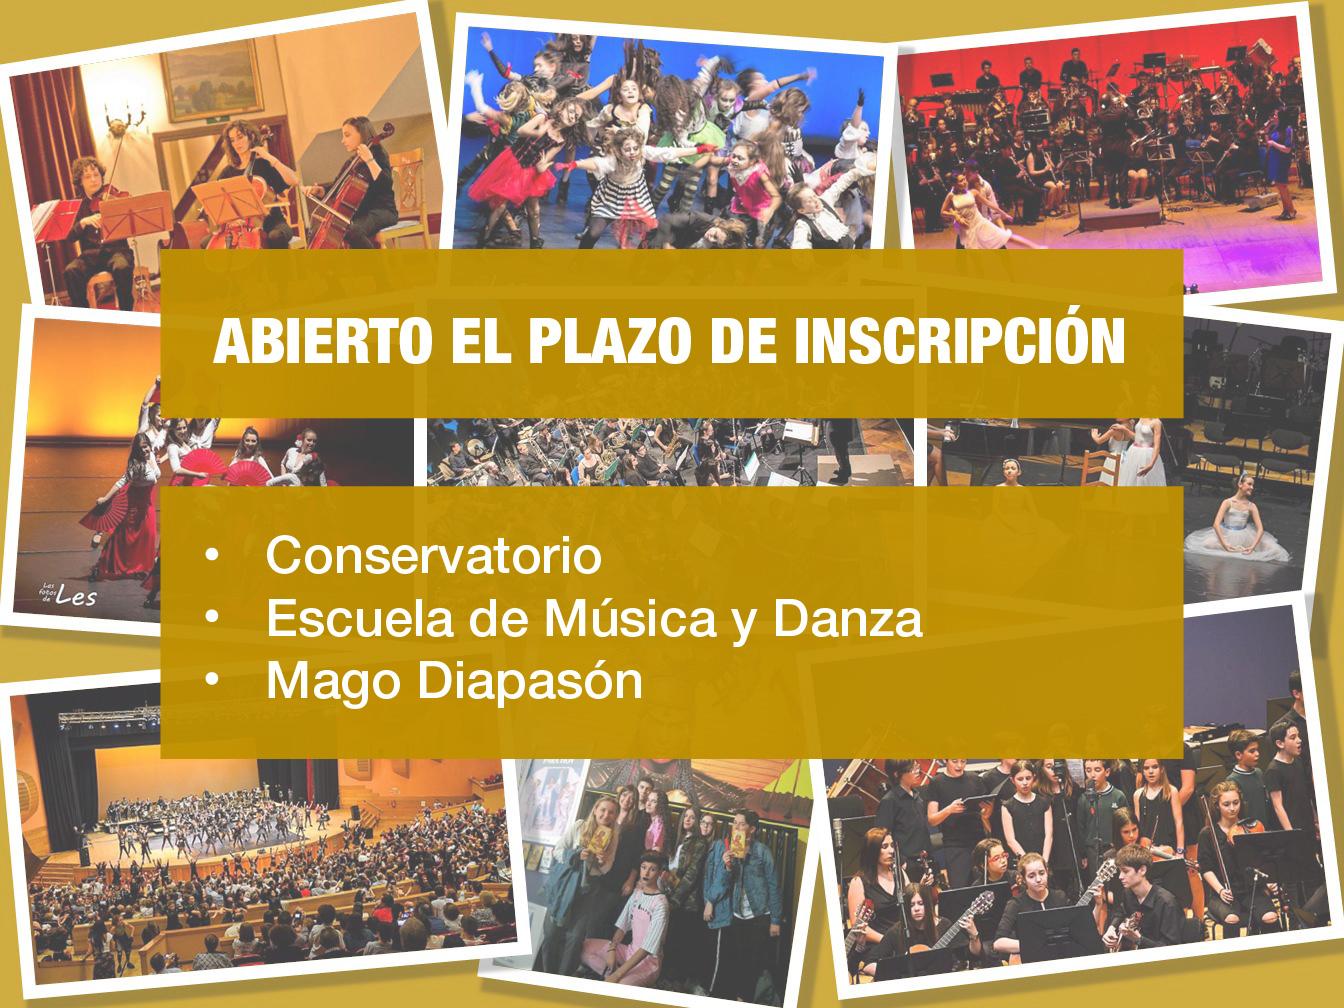 Collage Conservatorio inscripción-01